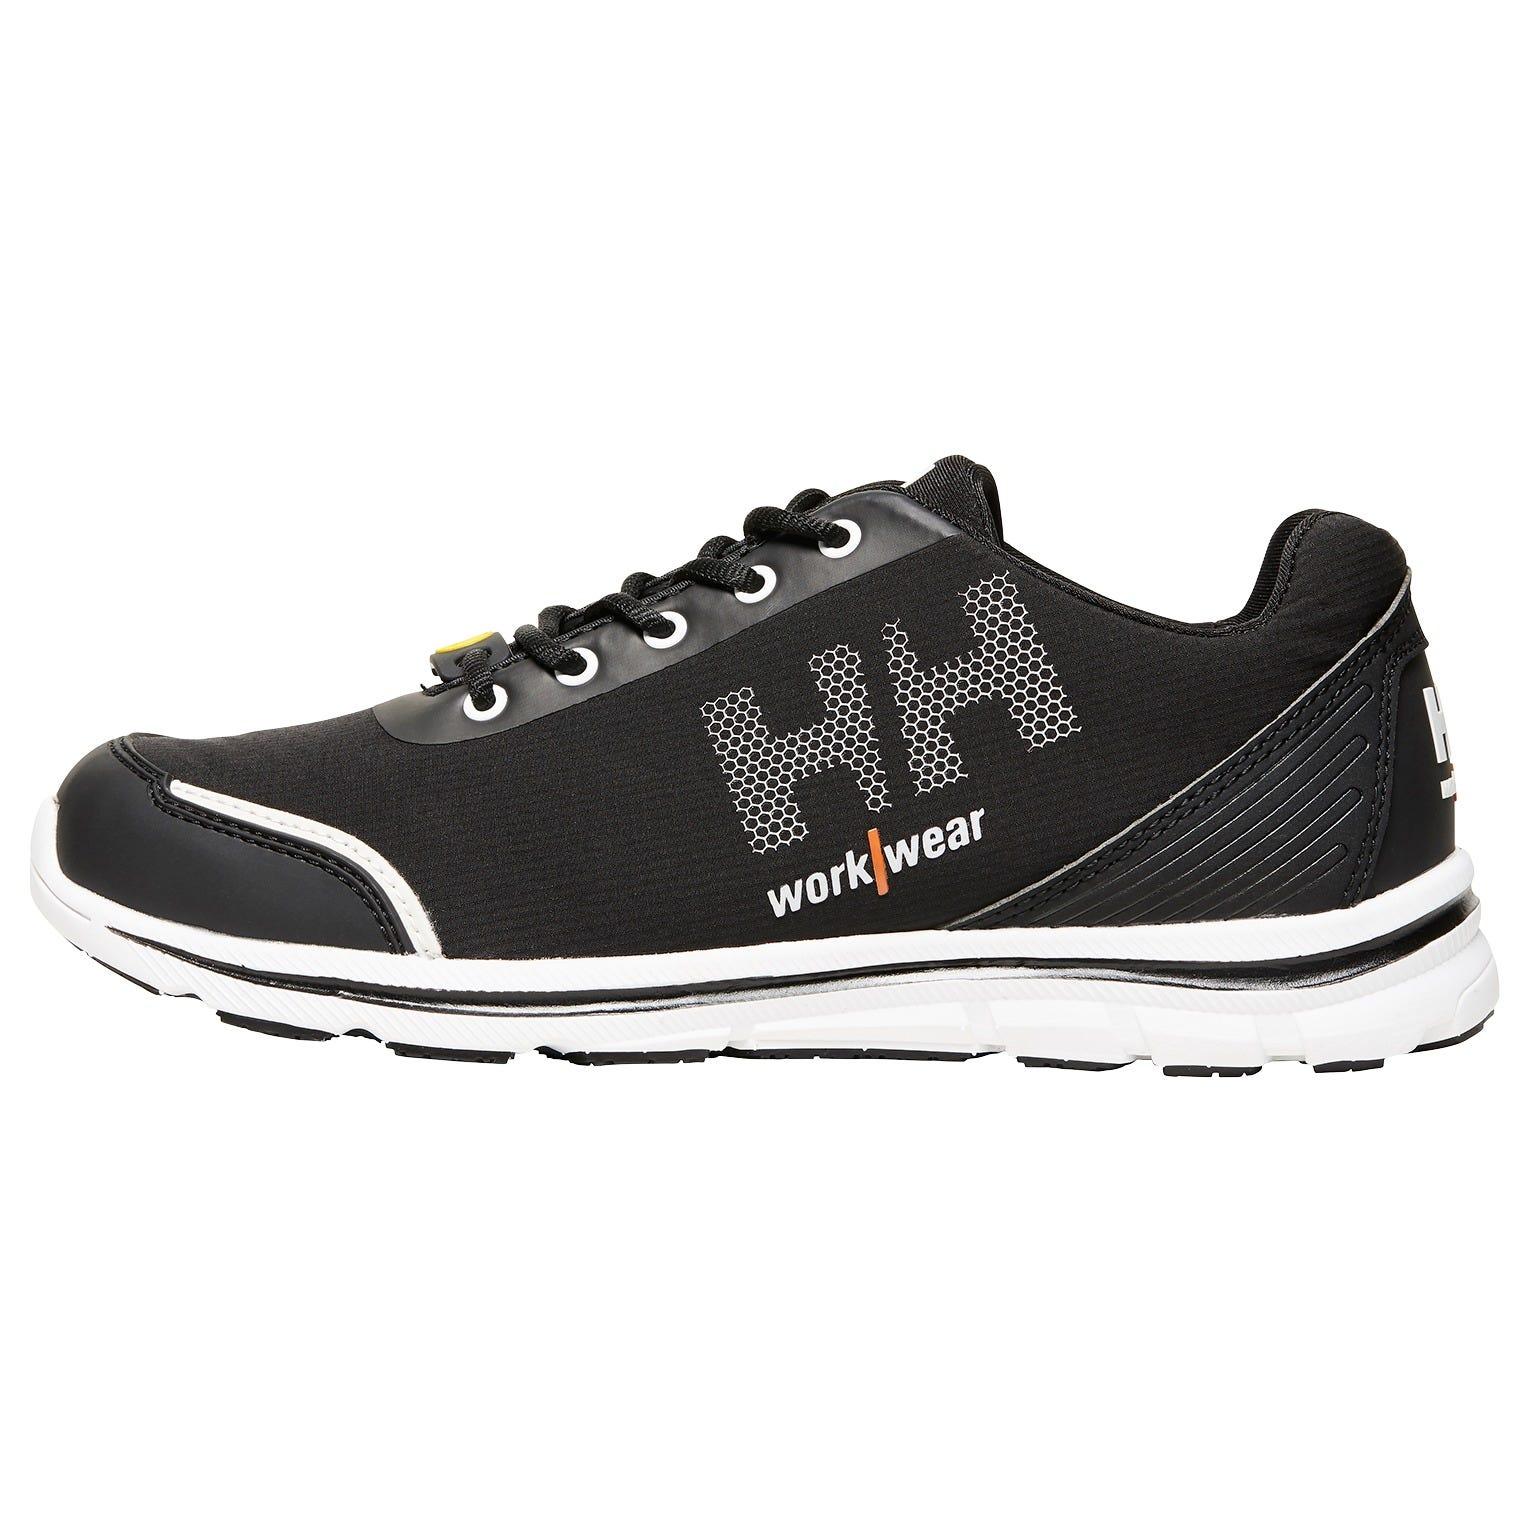 hh workwear workwear helly hansen scarpa antinfortunistica oslo st certificata o1 antiscivolo 44 nero